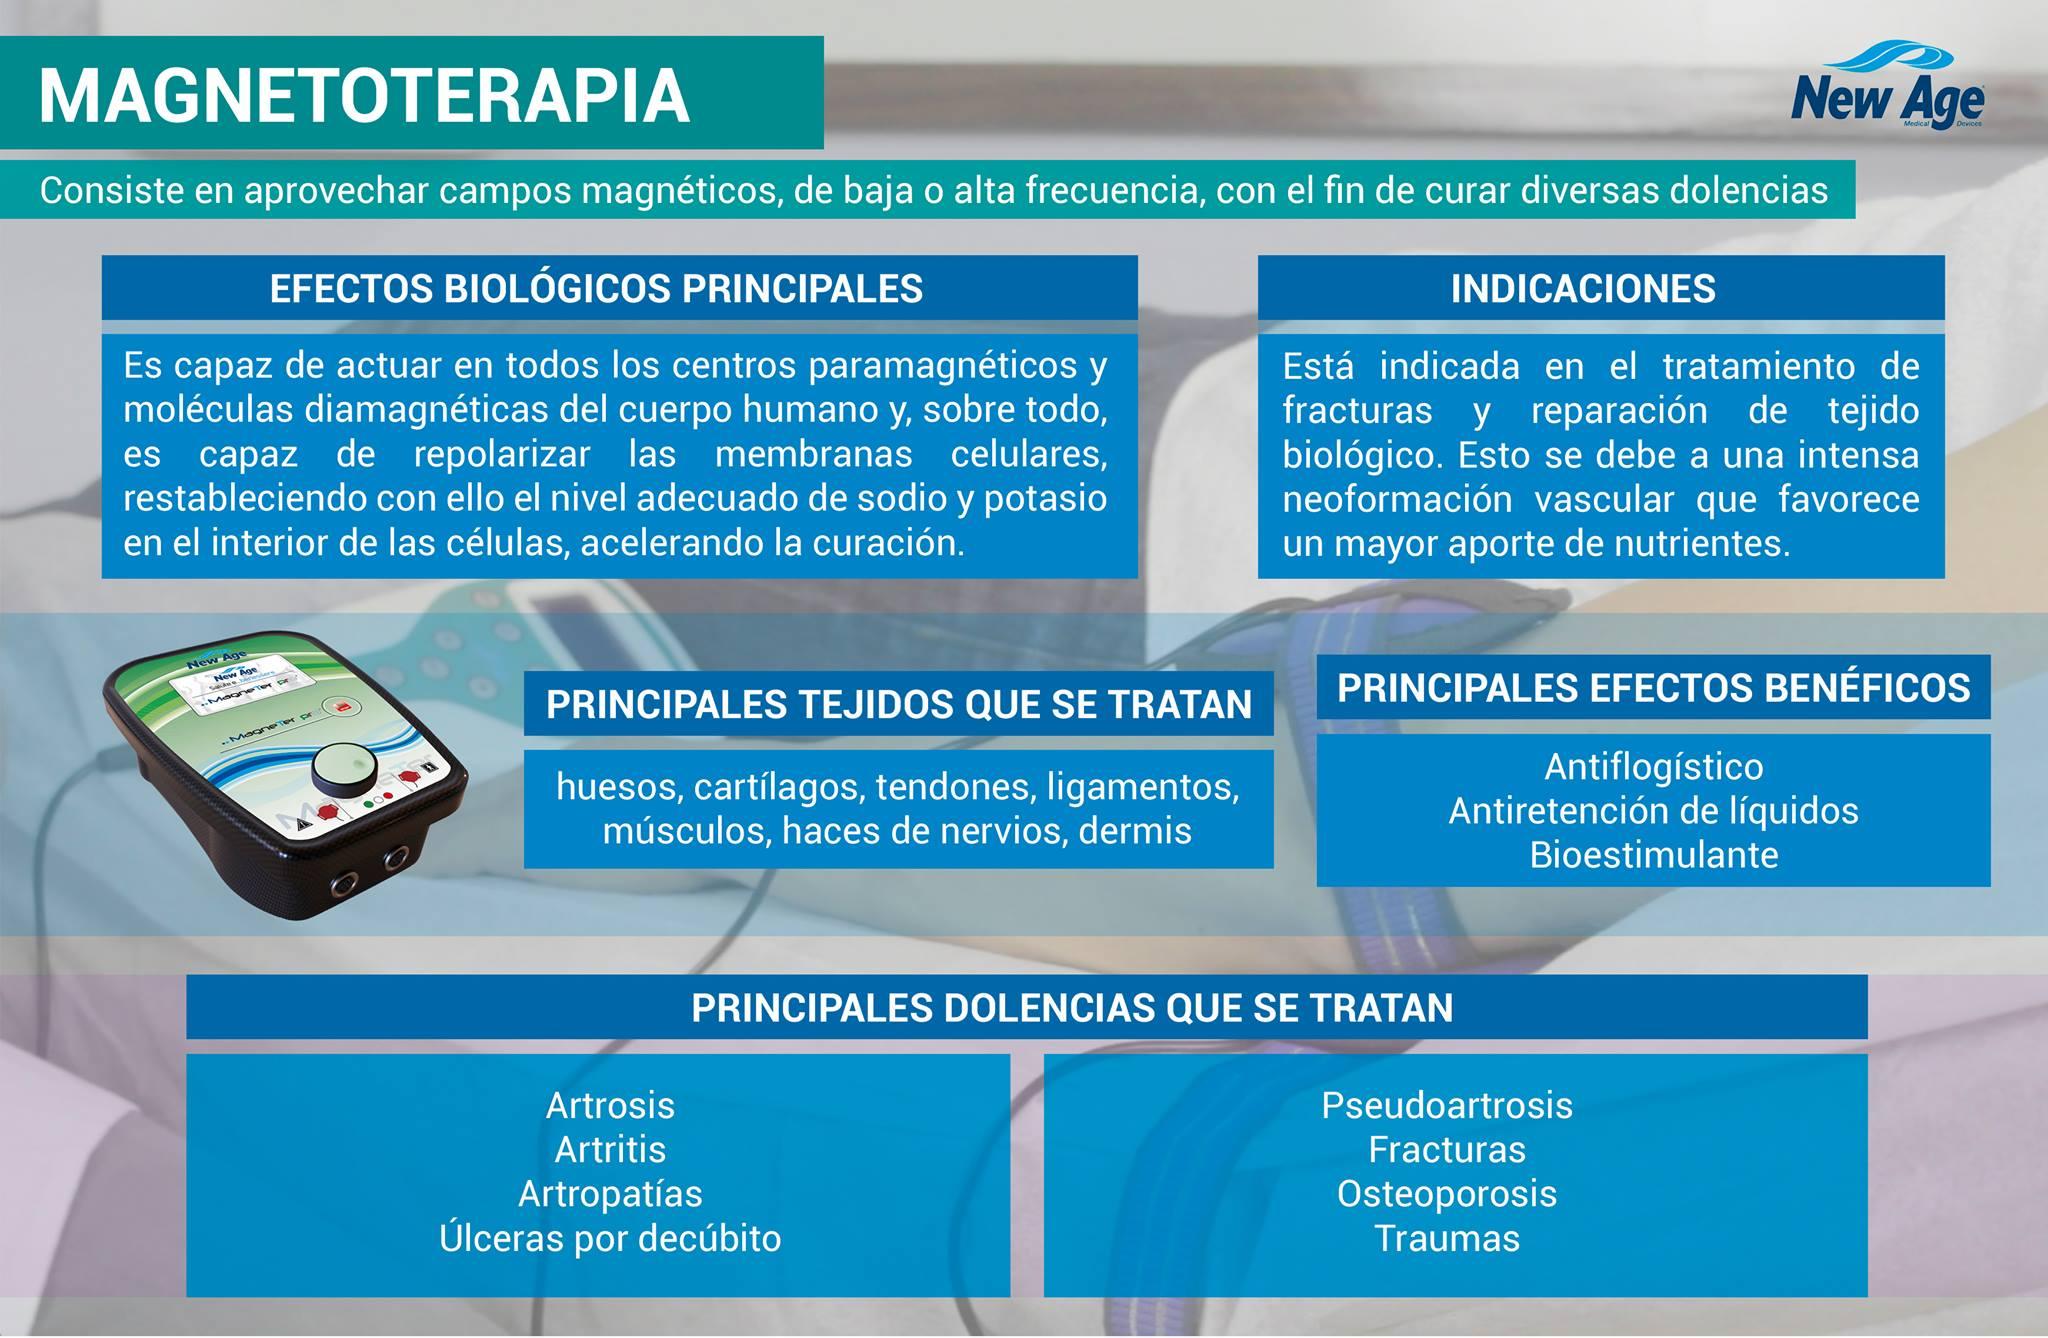 Infografía de New Age sobre la Magnetoterapia